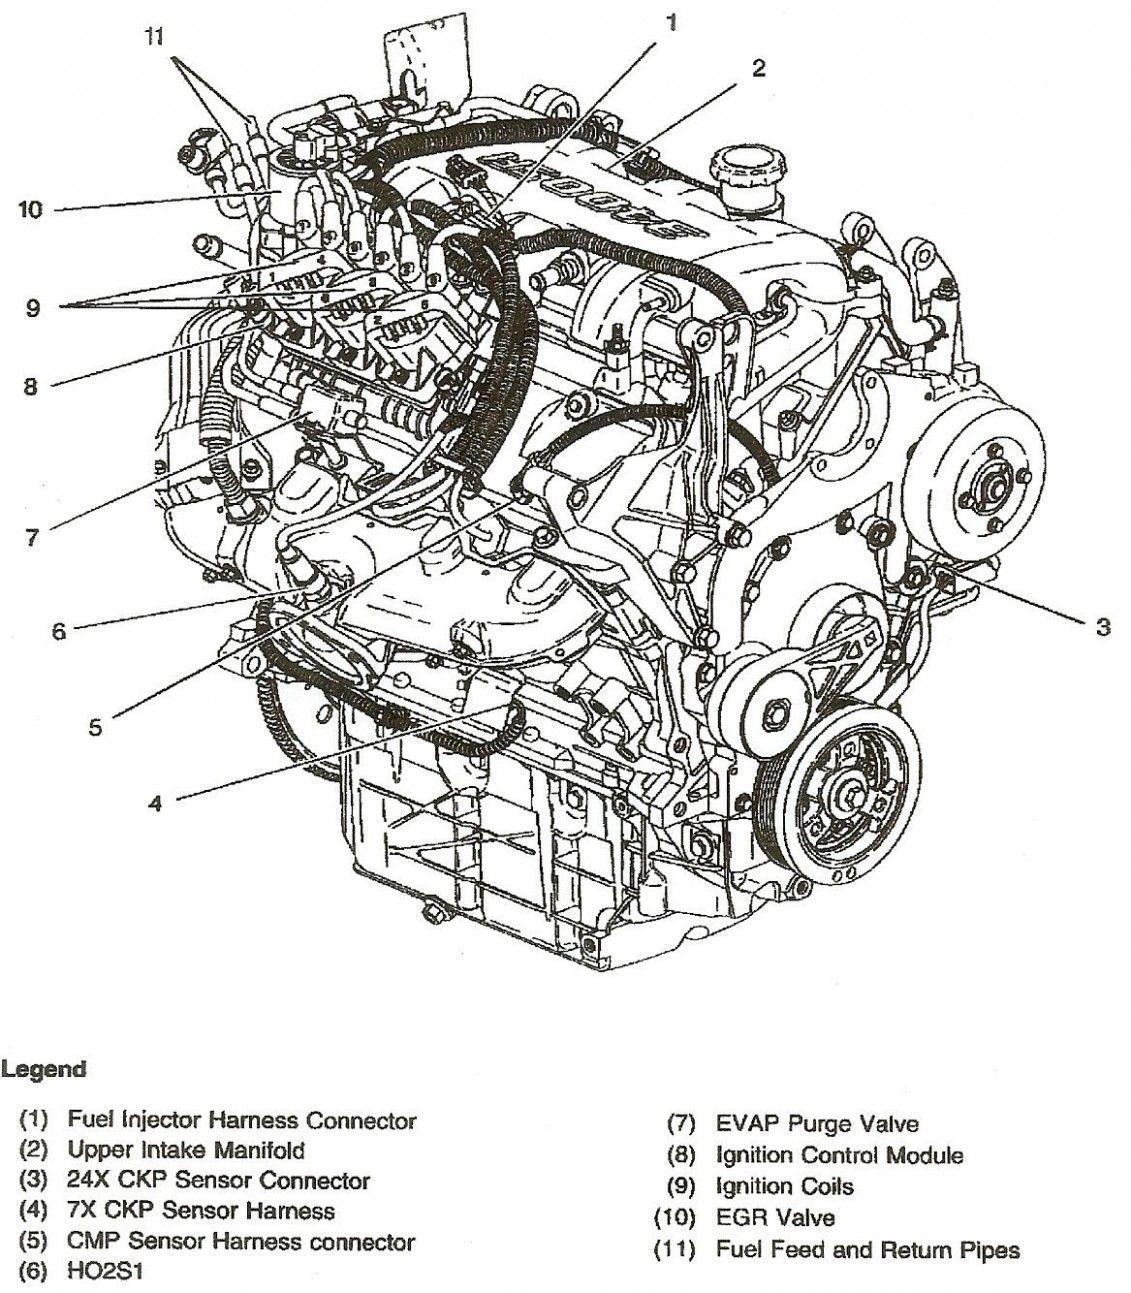 4 4 Vortec Engine Diagram Download Online 4 4 Vortec